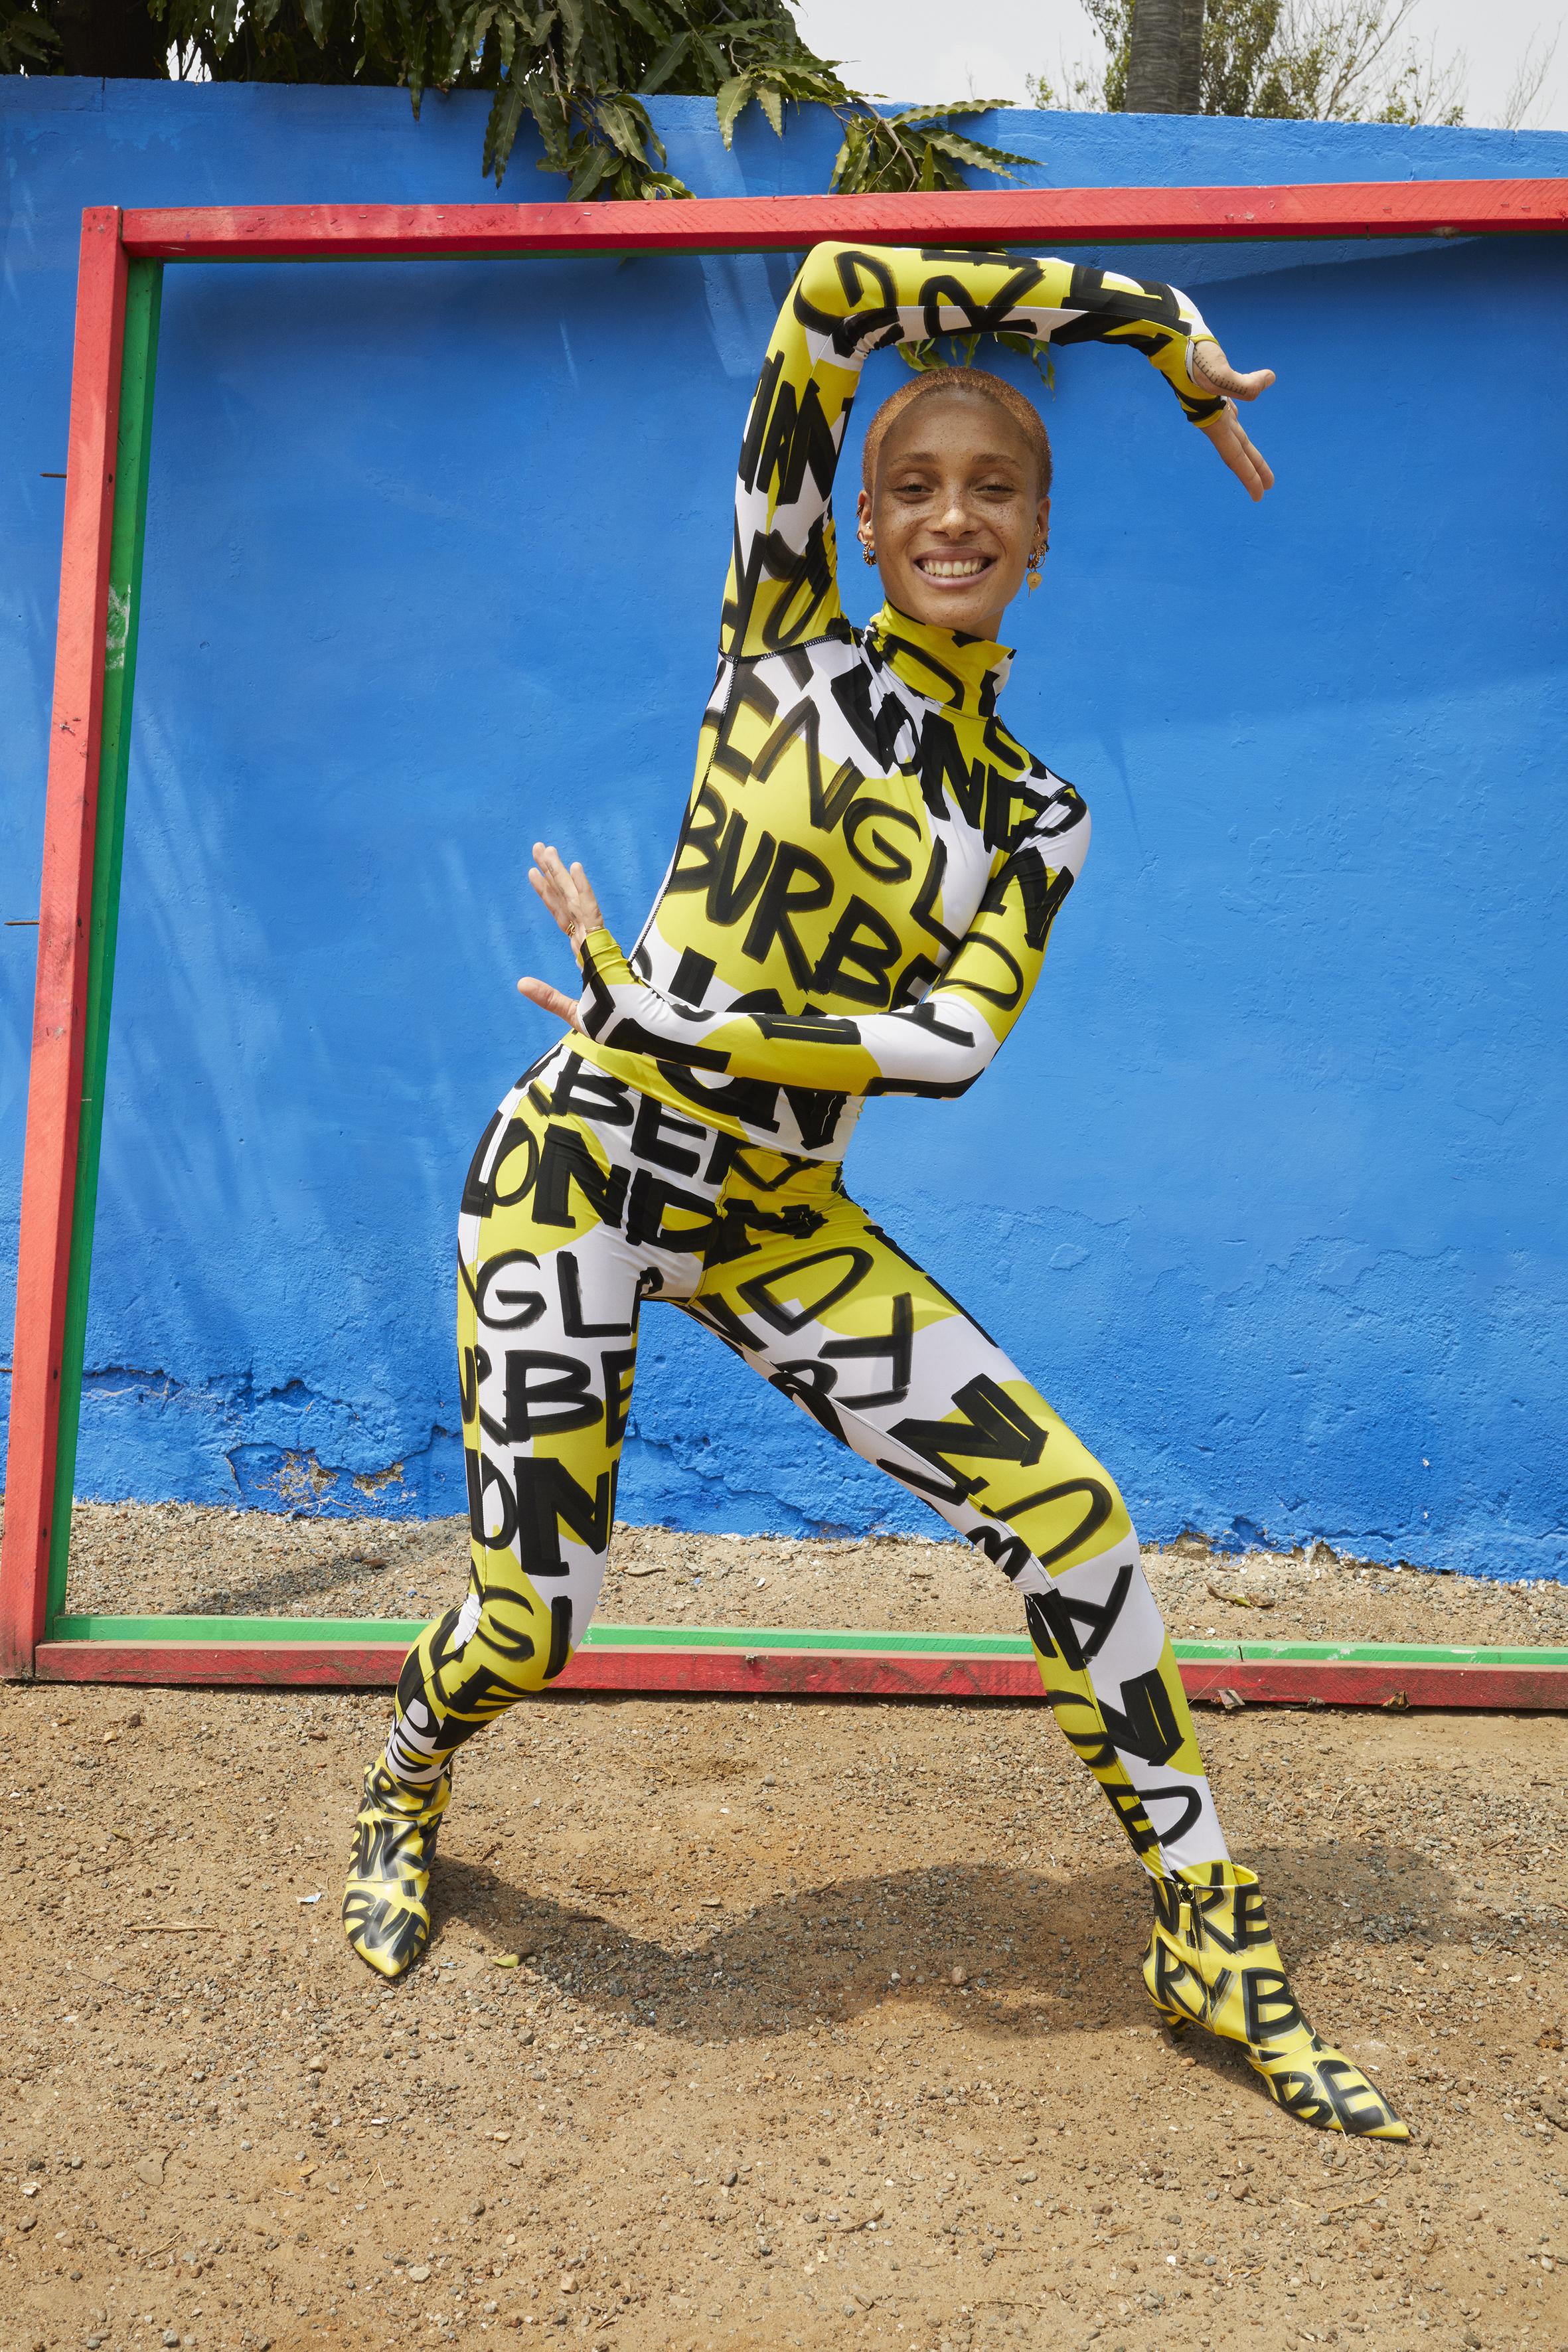 Adwoa Aboah in a graffiti-print bodysuit and leggings shot by Juergen Teller